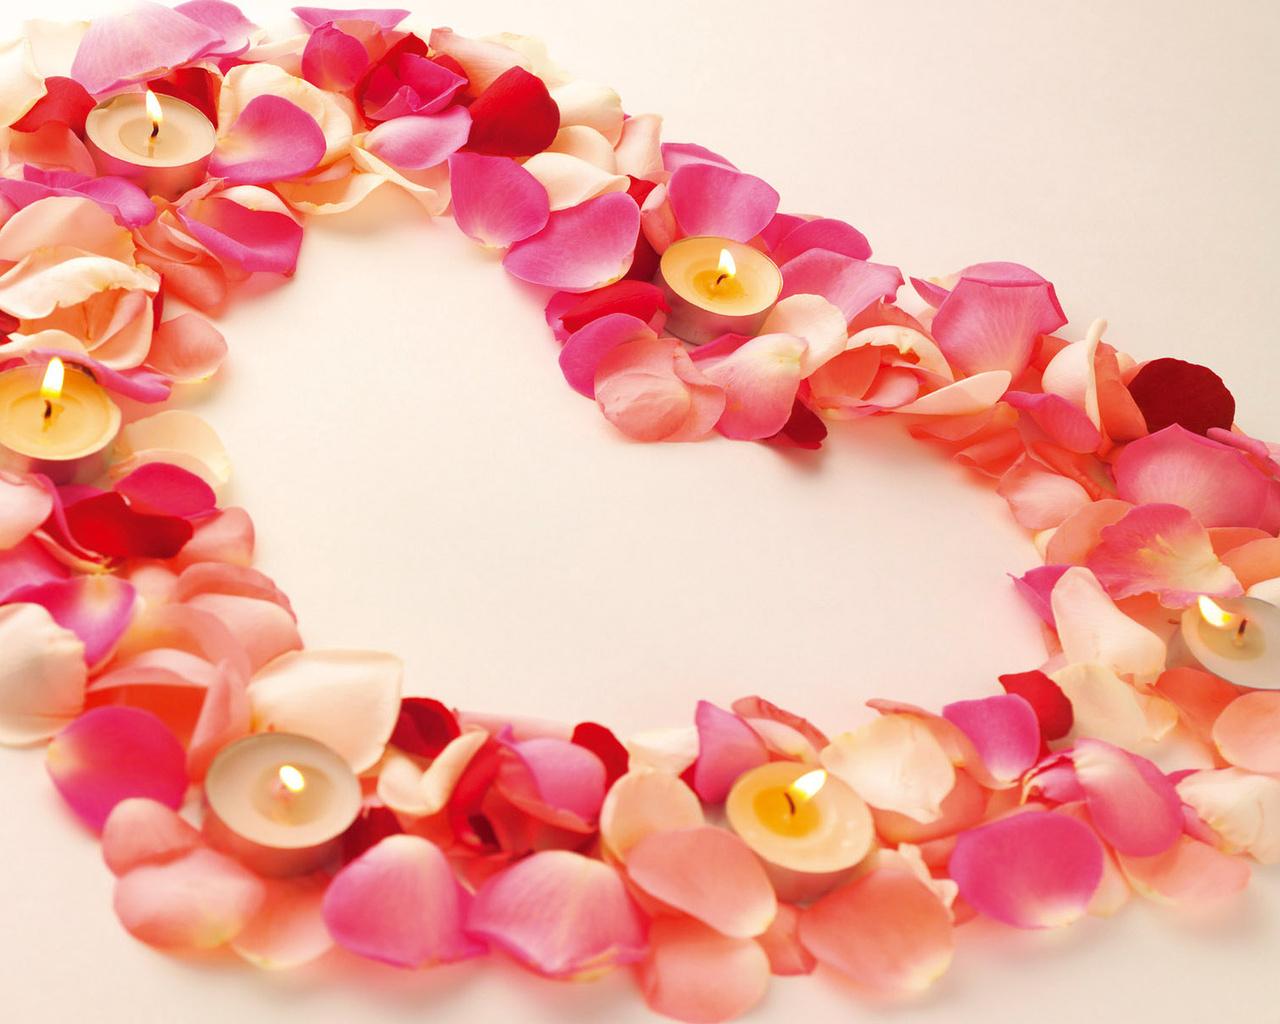 http://1.bp.blogspot.com/-hODoFI-rCvg/TzaFmmQO1bI/AAAAAAAACqU/OcCYLfd_No4/s1600/Valentines-Day-Wallpaper-08.jpg